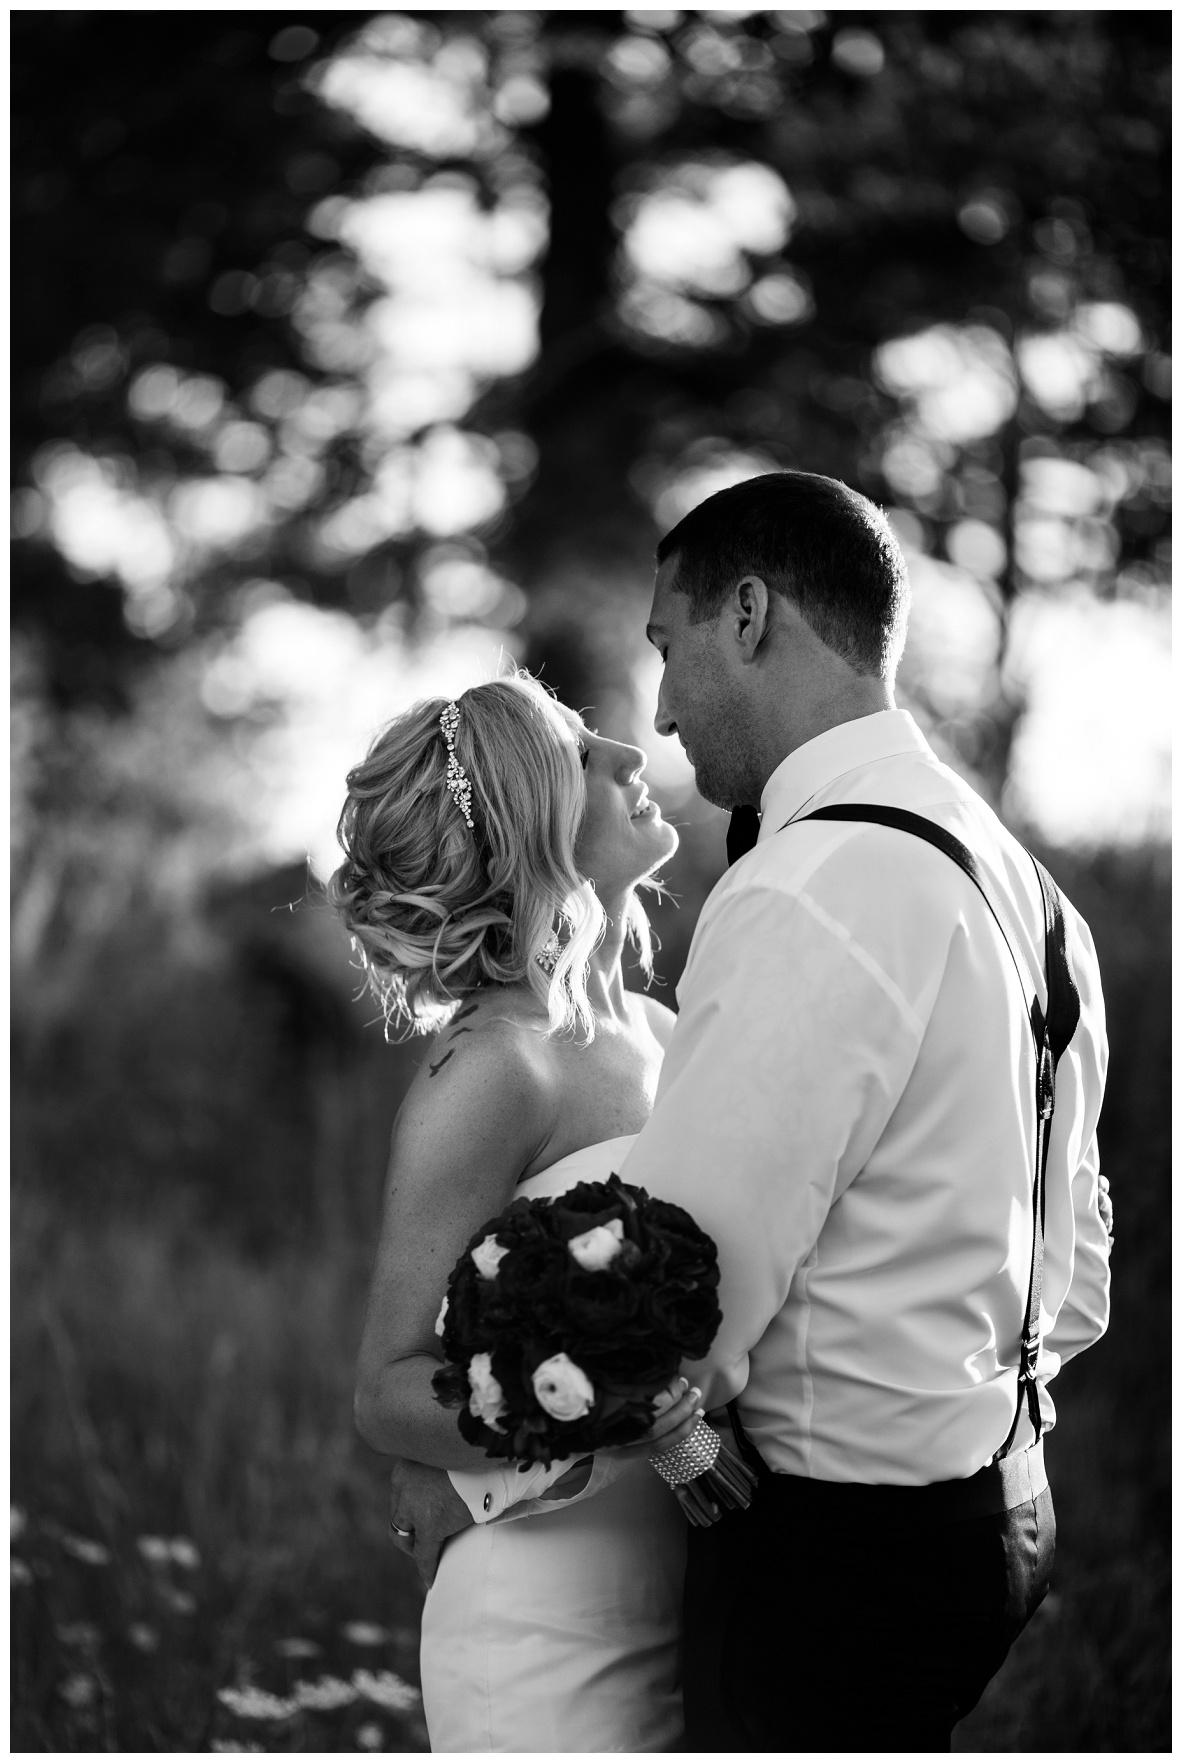 Mr. and Mrs. Papp_0069.jpg